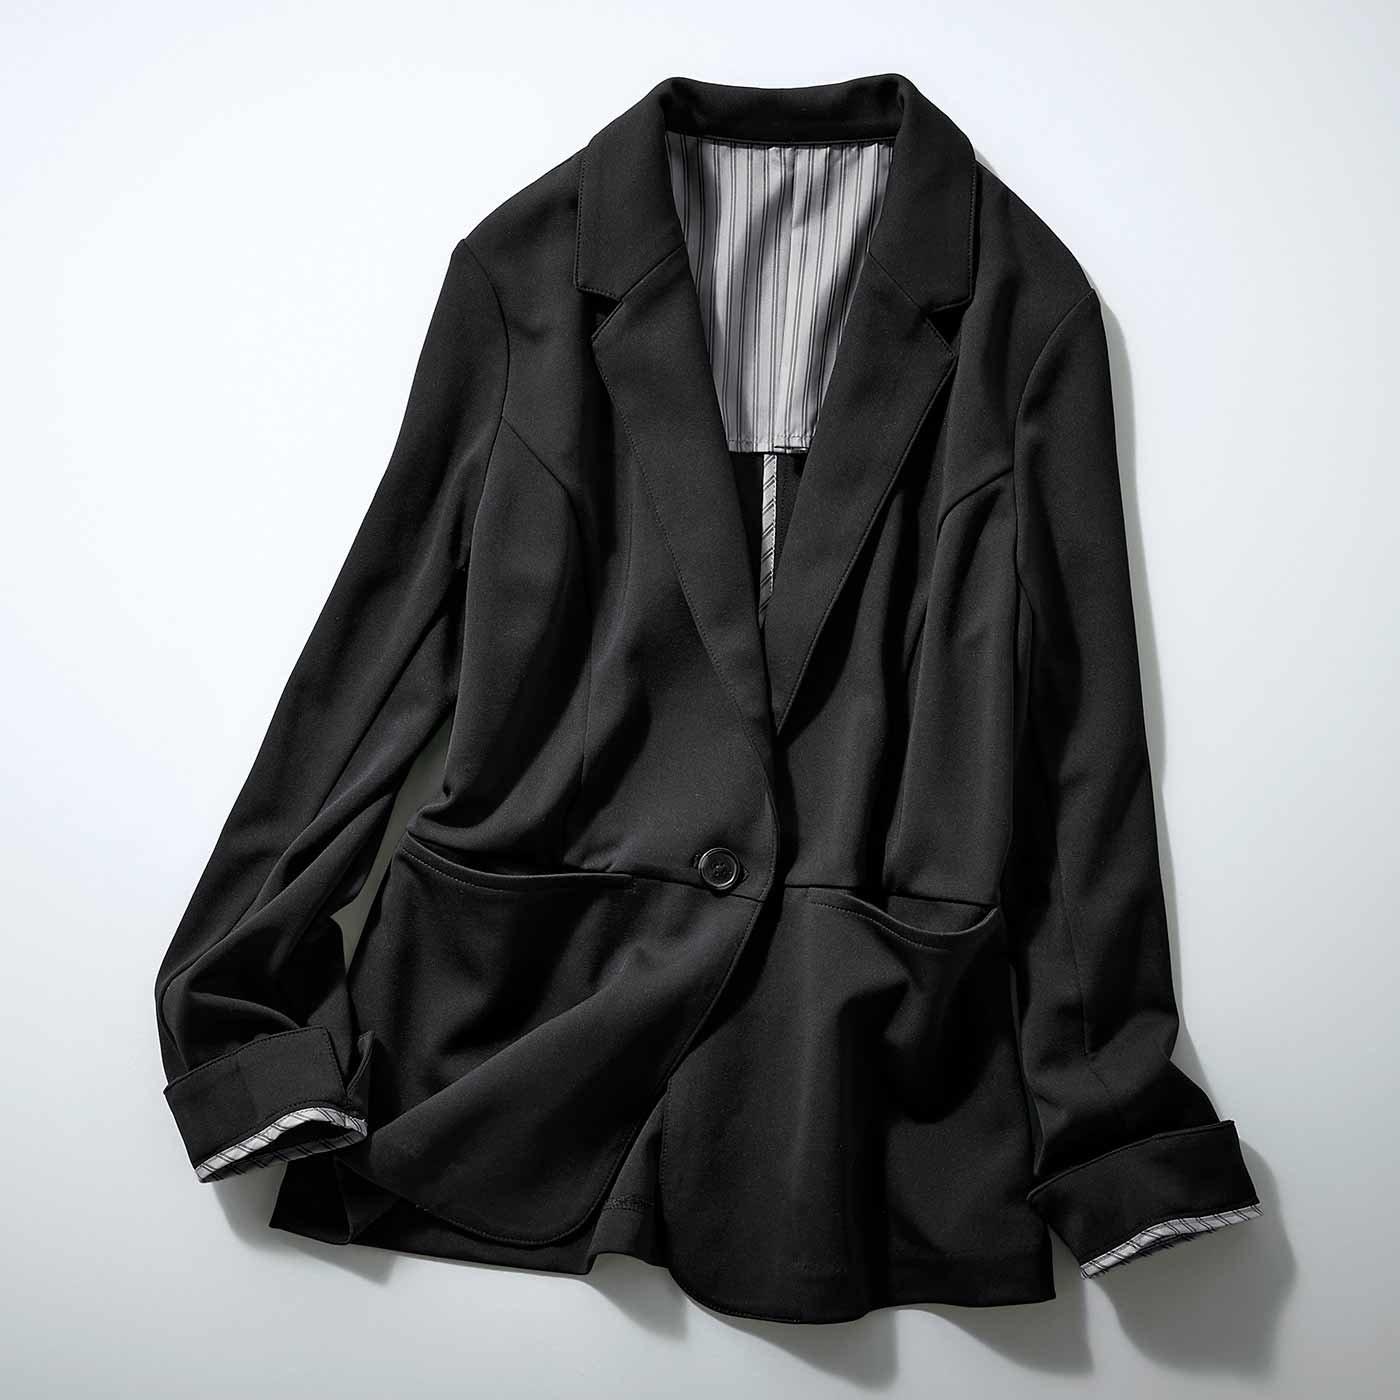 IEDIT[イディット] 花粉リリース&UVカットで快適優秀なバレエフィット(R)ジャケット〈ブラック〉